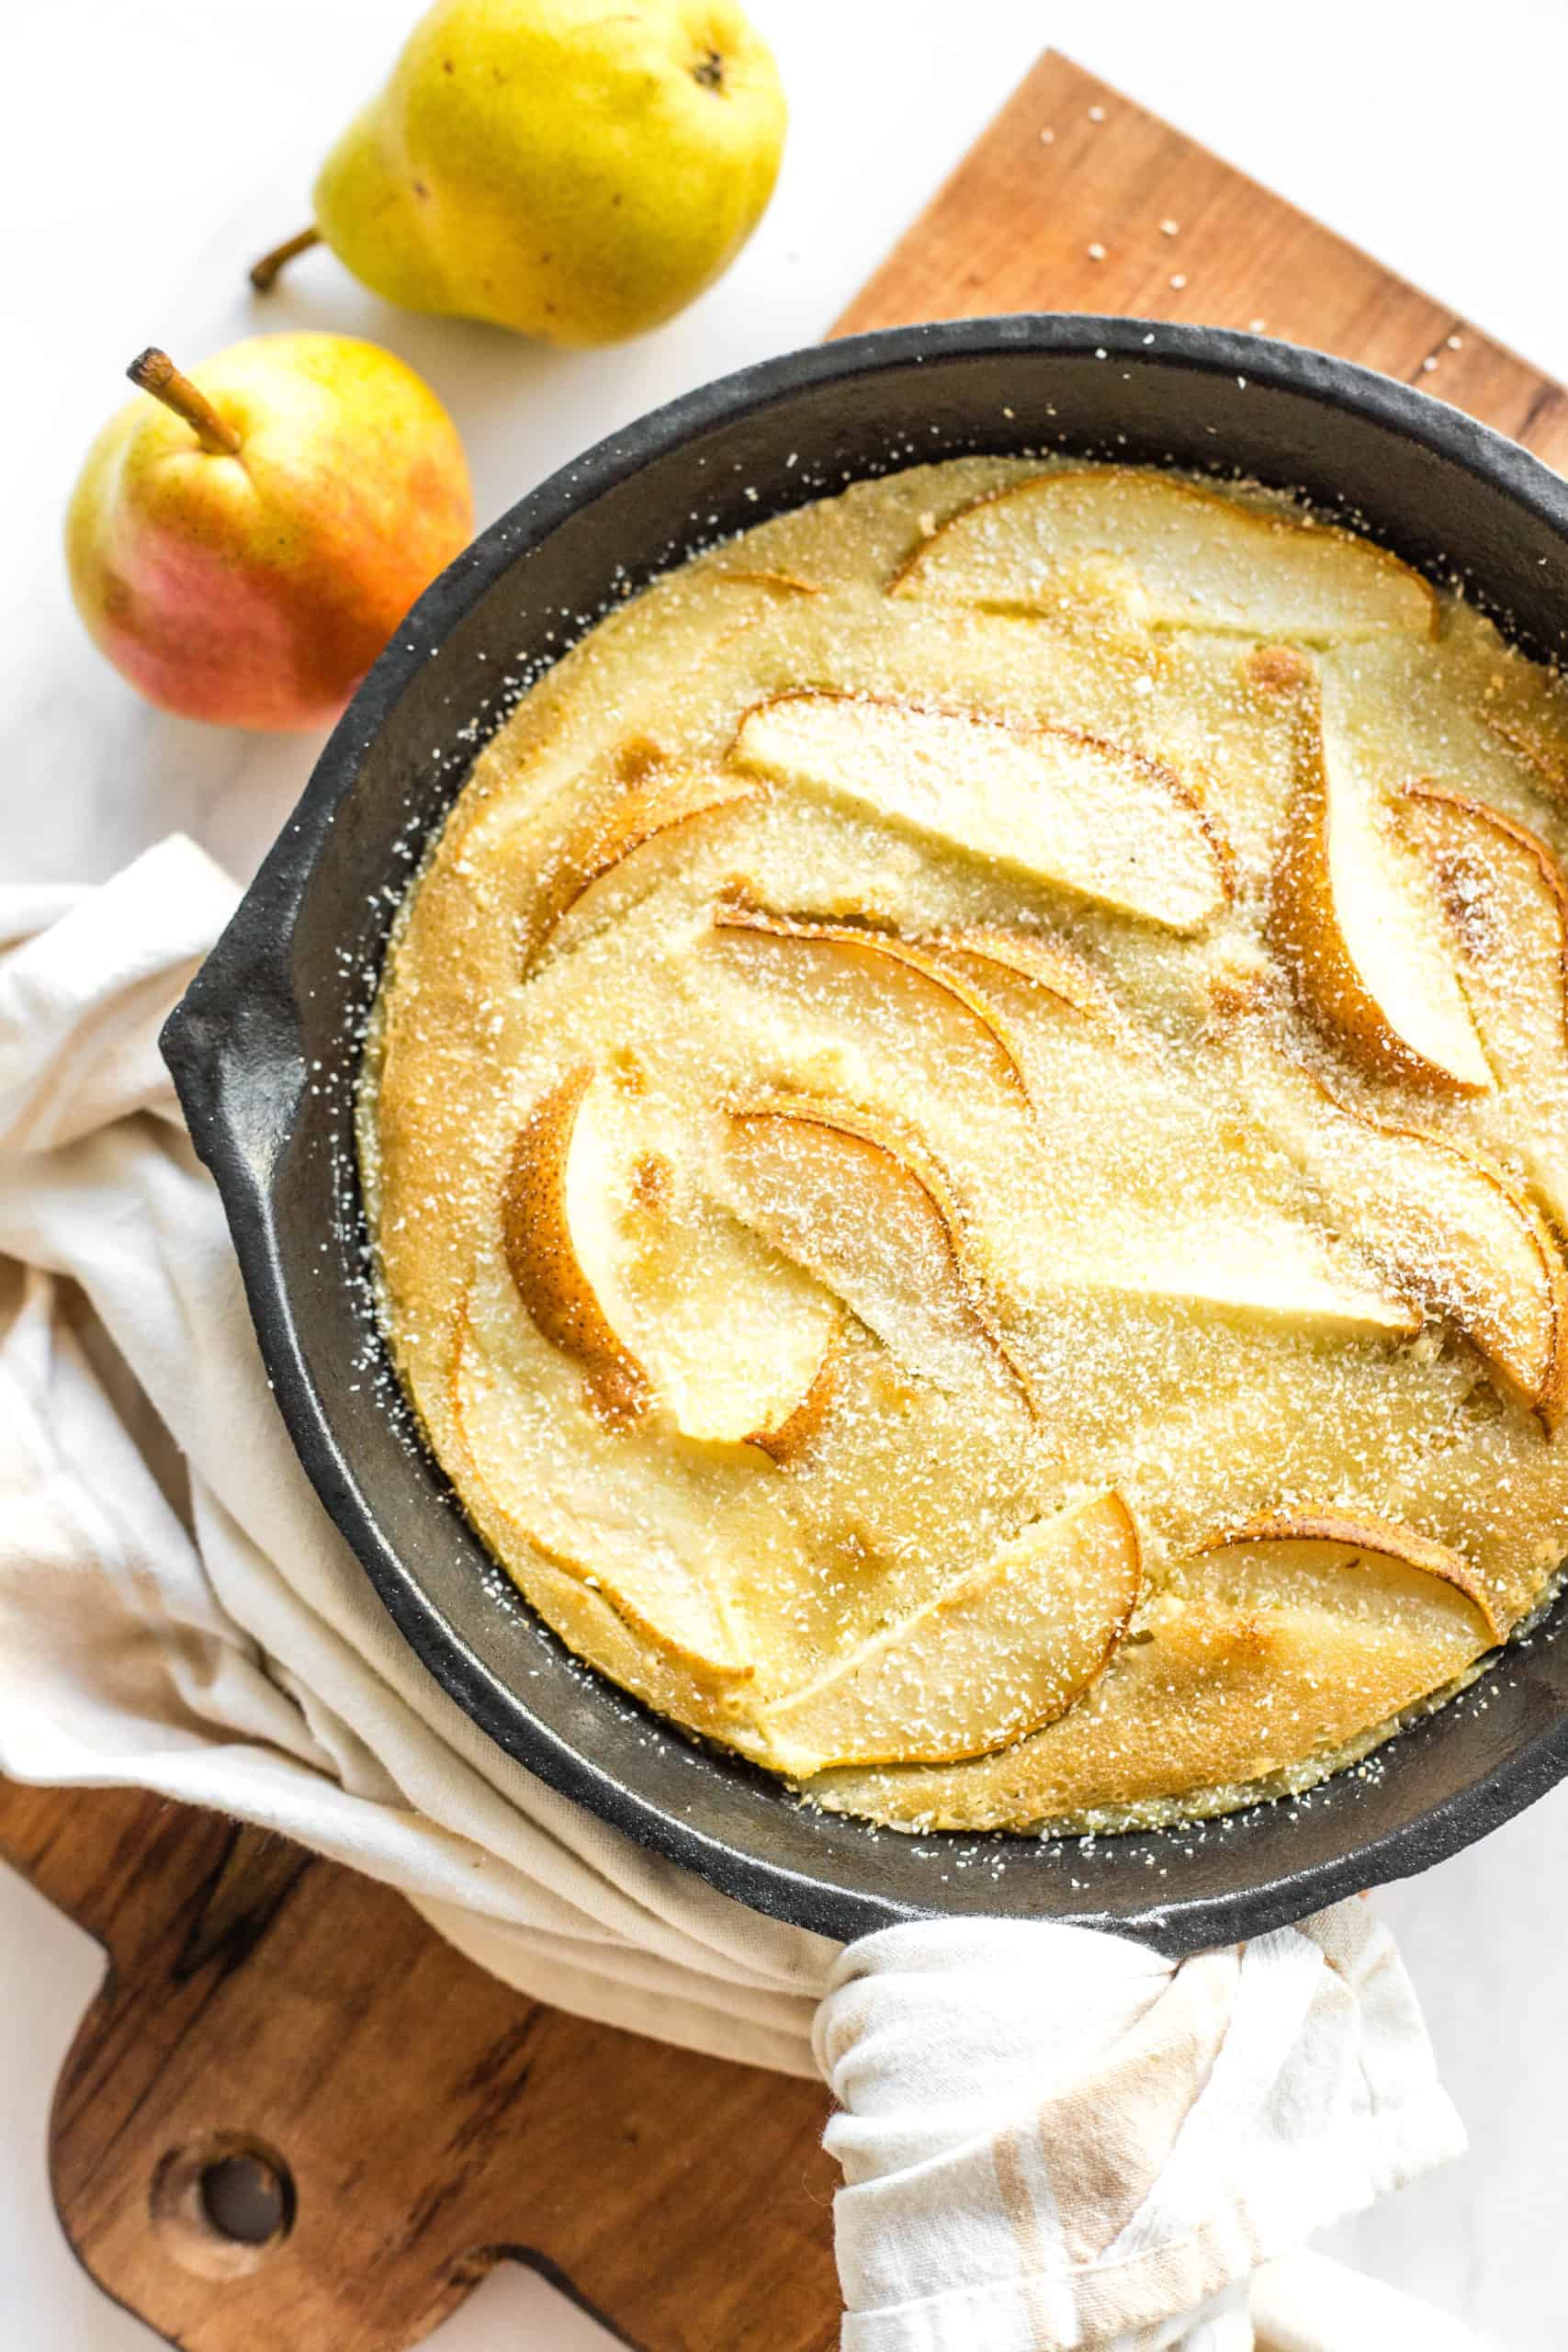 Pear custard pie in a cast iron skillet.